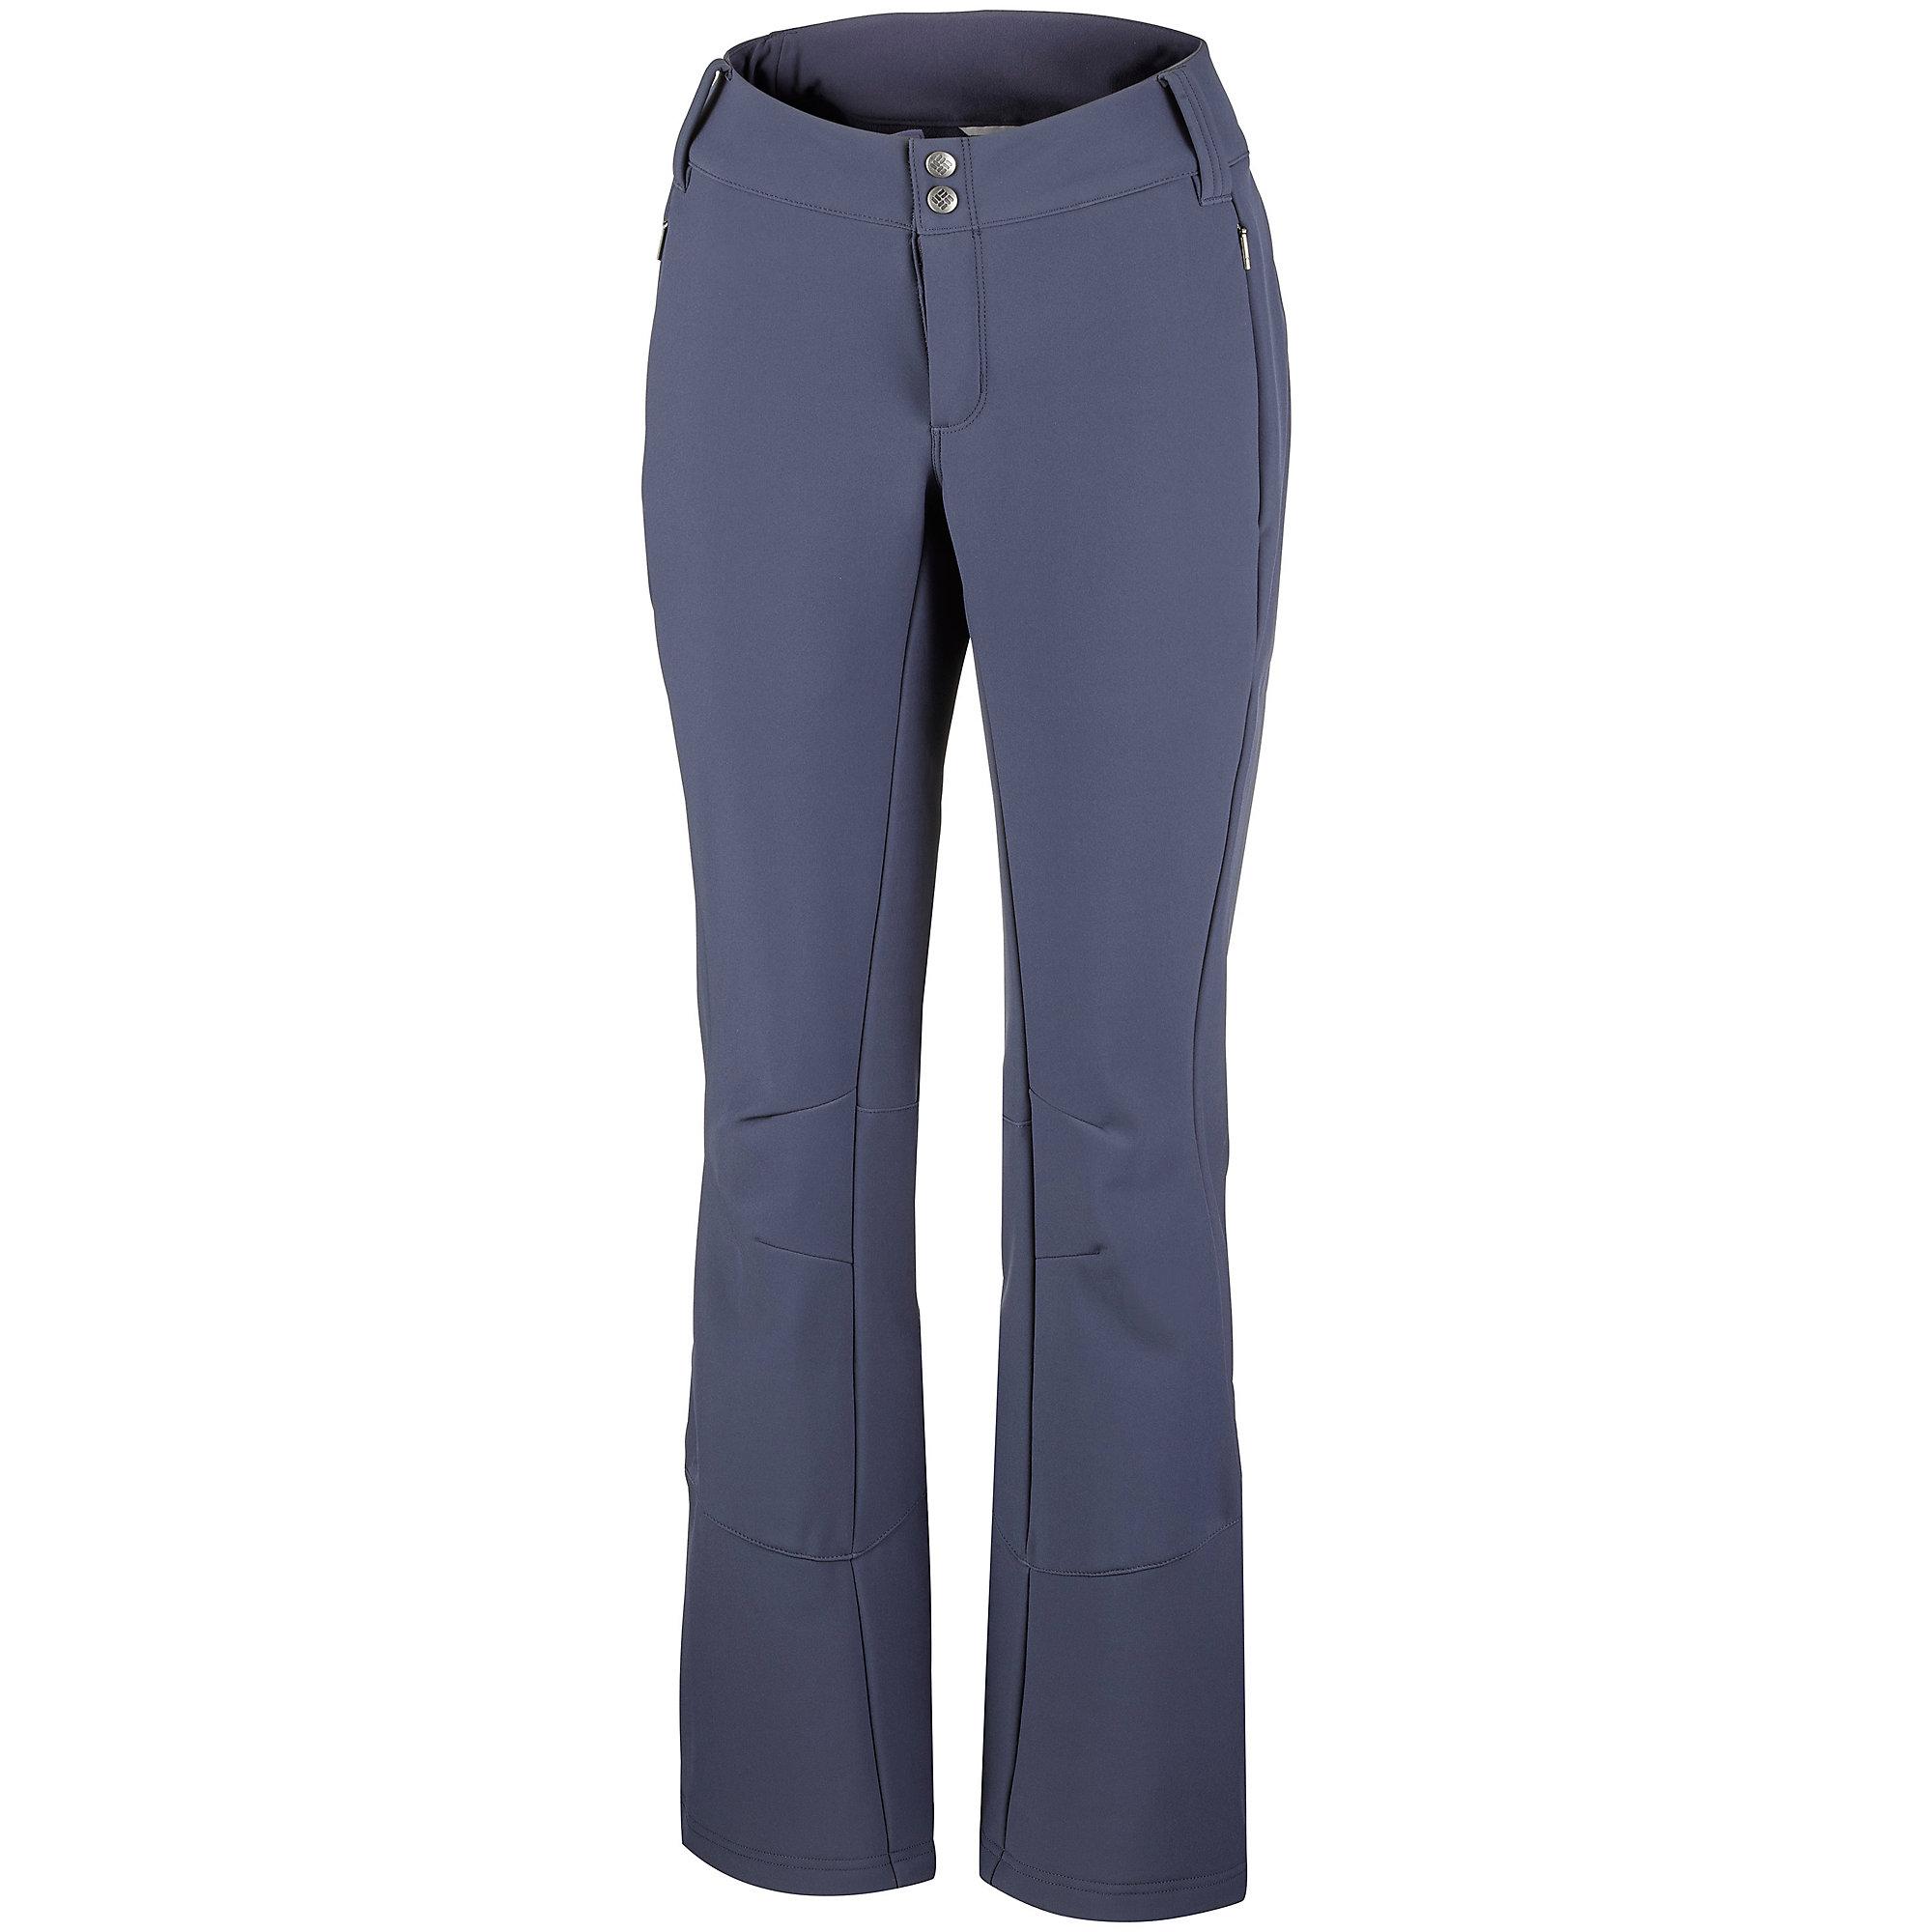 Pantalon De Ski Roffe™ Ridge Femme